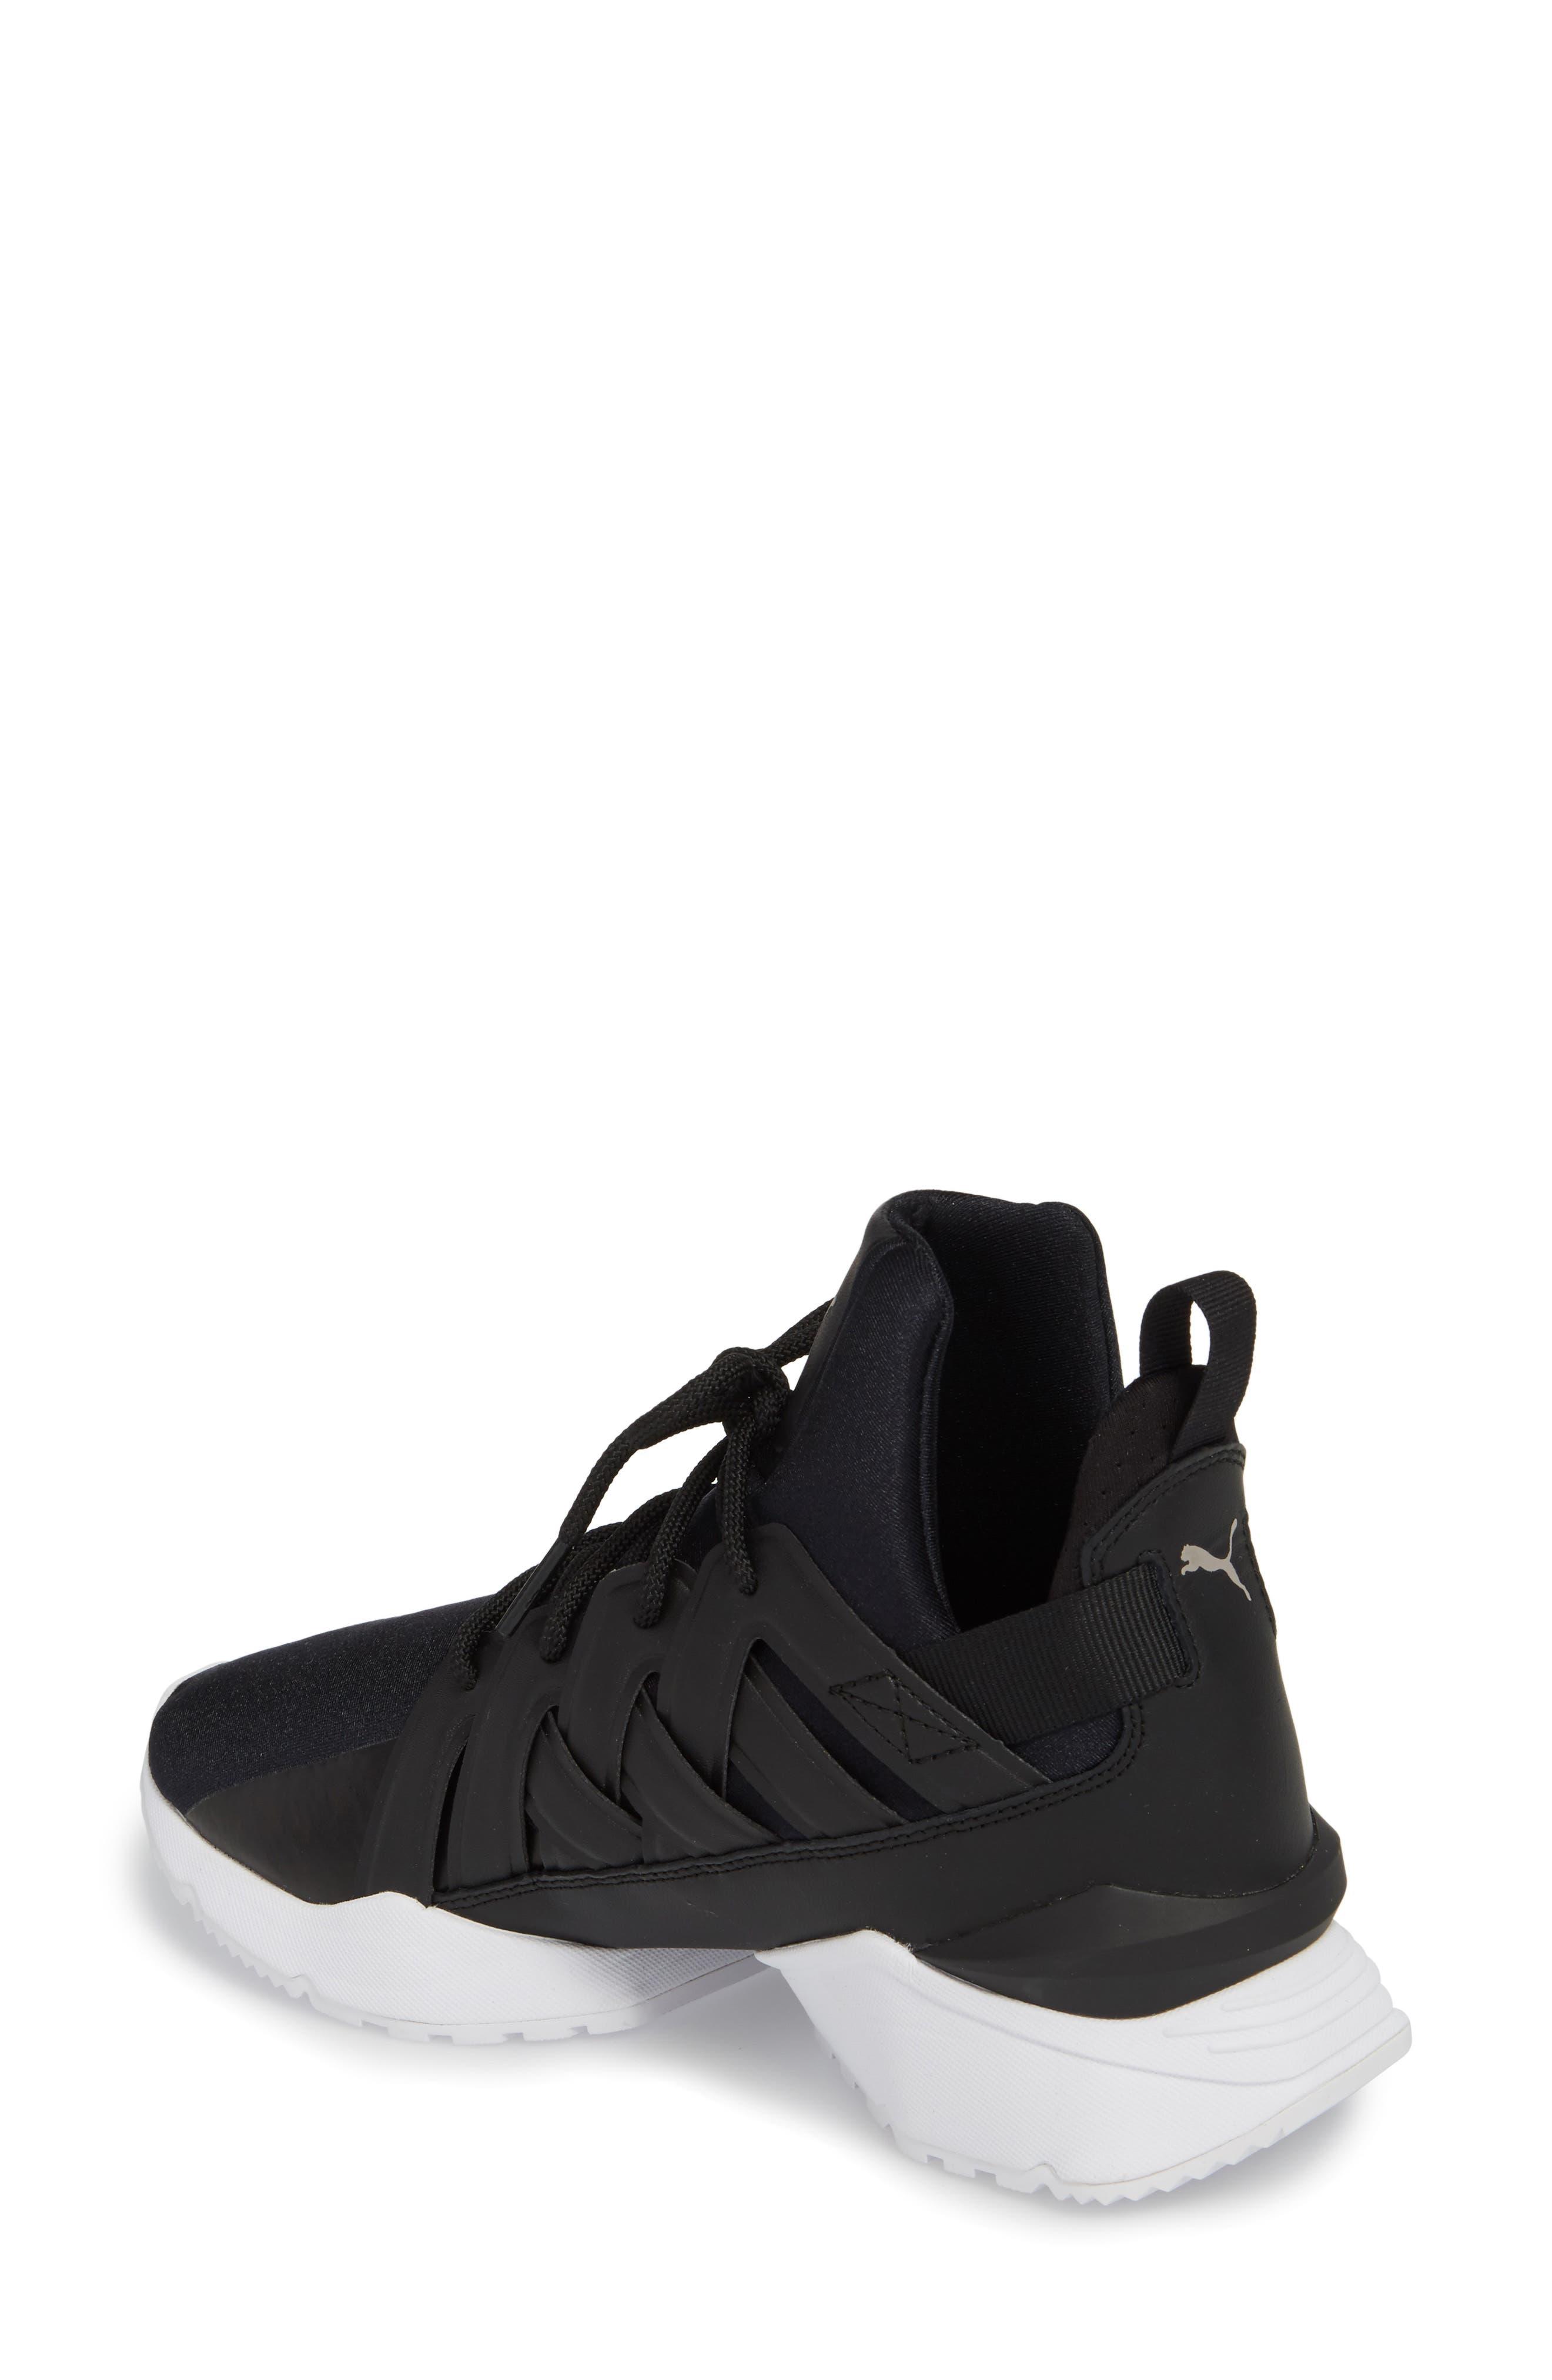 Muse Echo Satin En Pointe High Top Sneaker,                             Alternate thumbnail 2, color,                             Puma Black/ Puma White